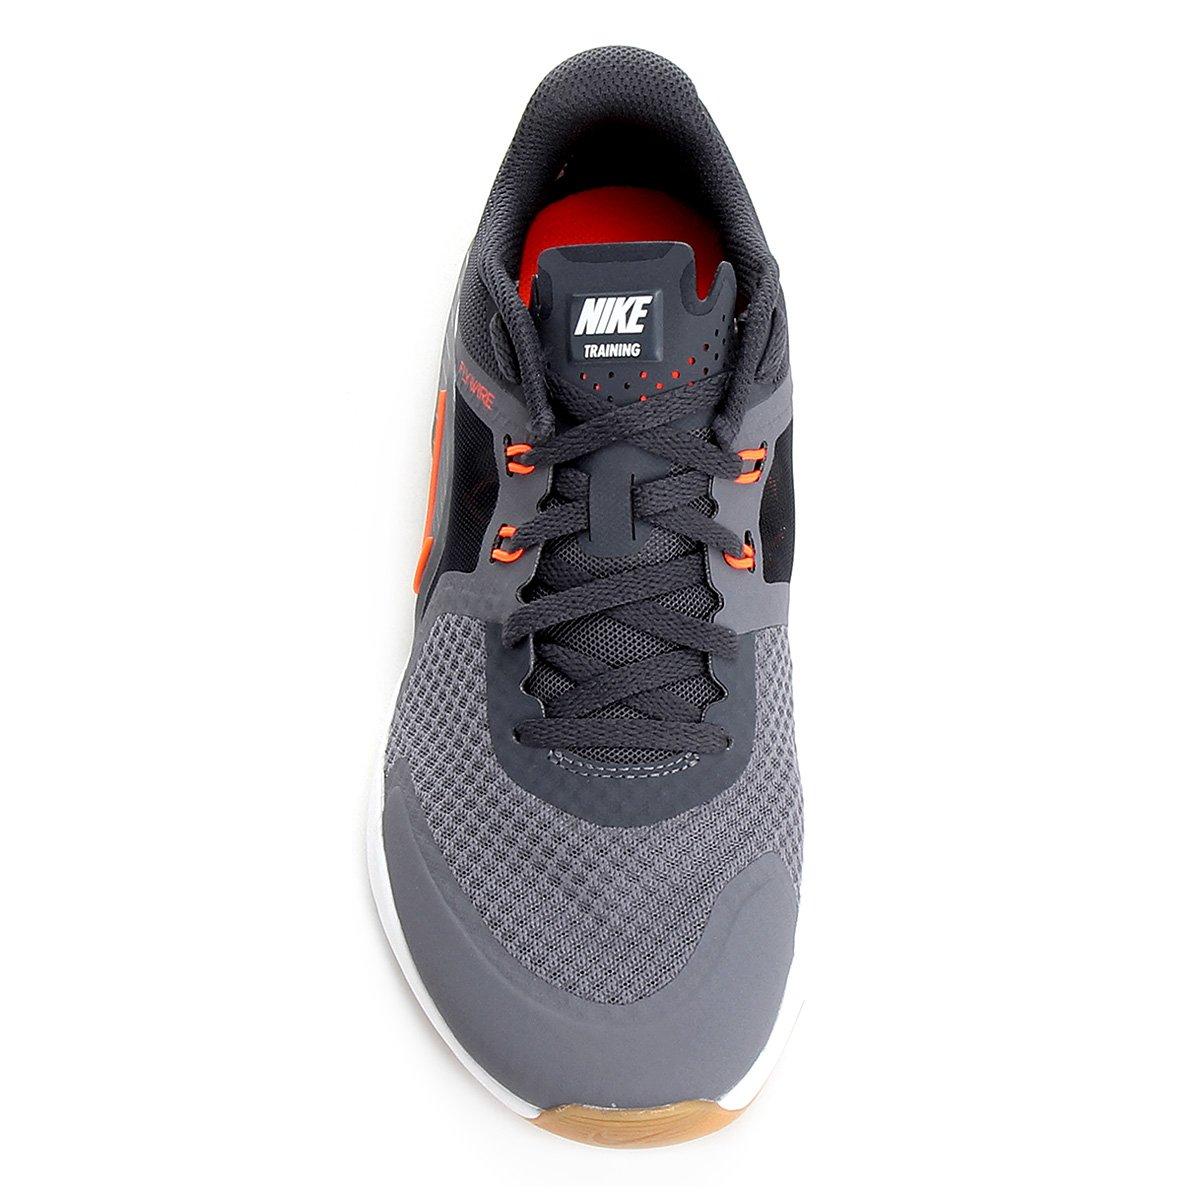 Laranja Complete 2 Cinza e Zoom Train Nike Tênis Masculino 8CzIwqUxt